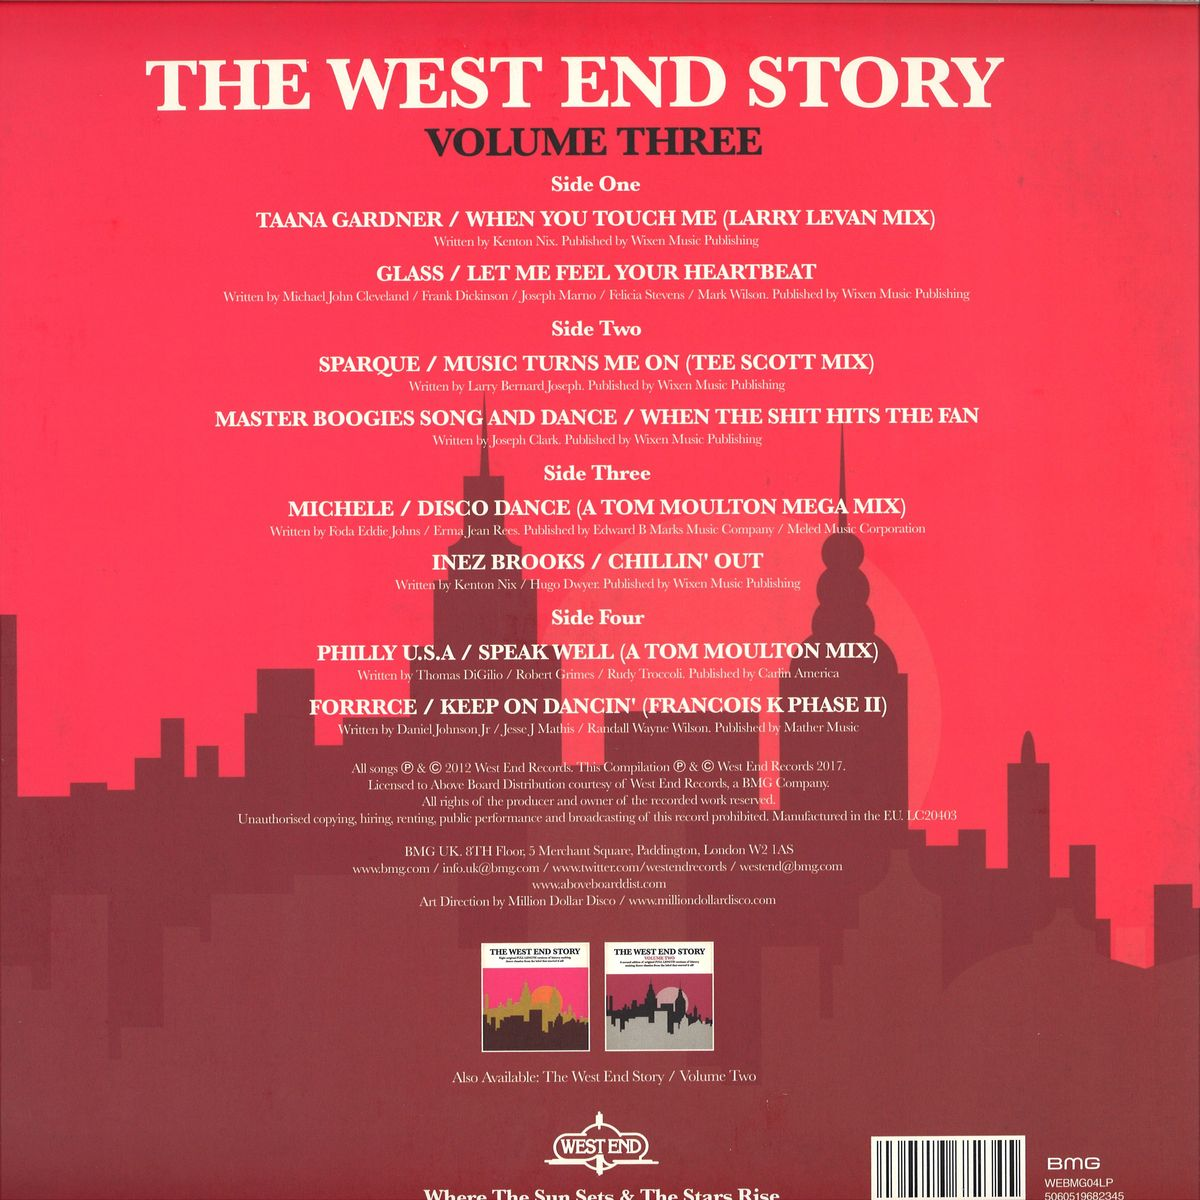 deejay de - WEST END RECORDS